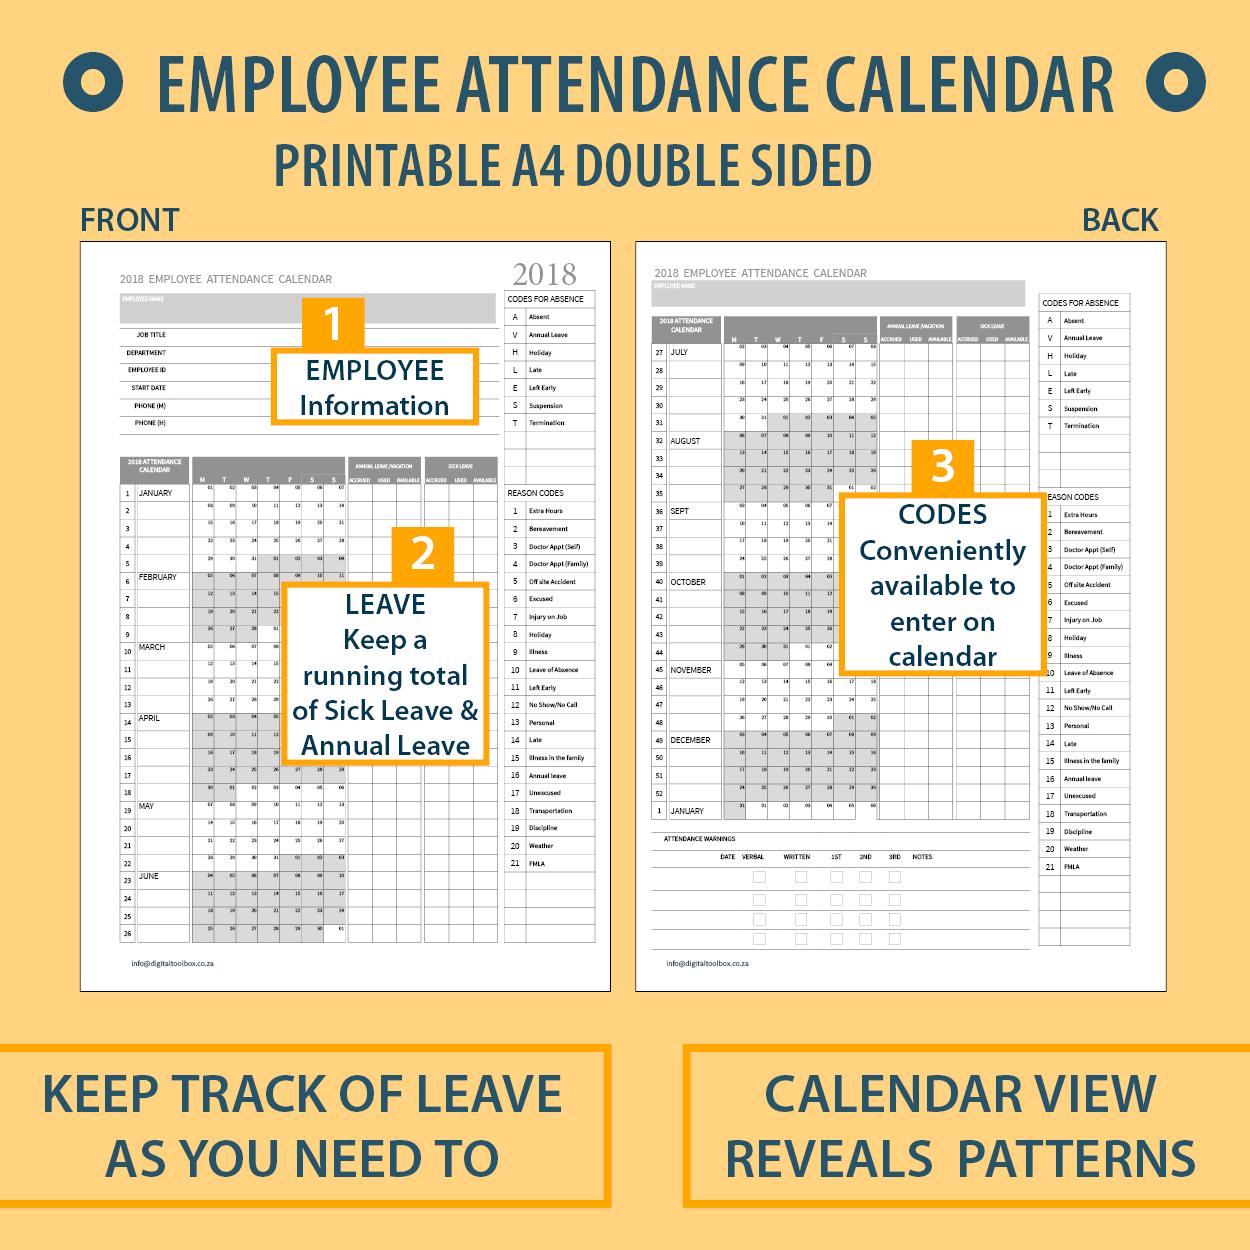 2020 A4 Printable Employee Attendance Calendar/tracker For